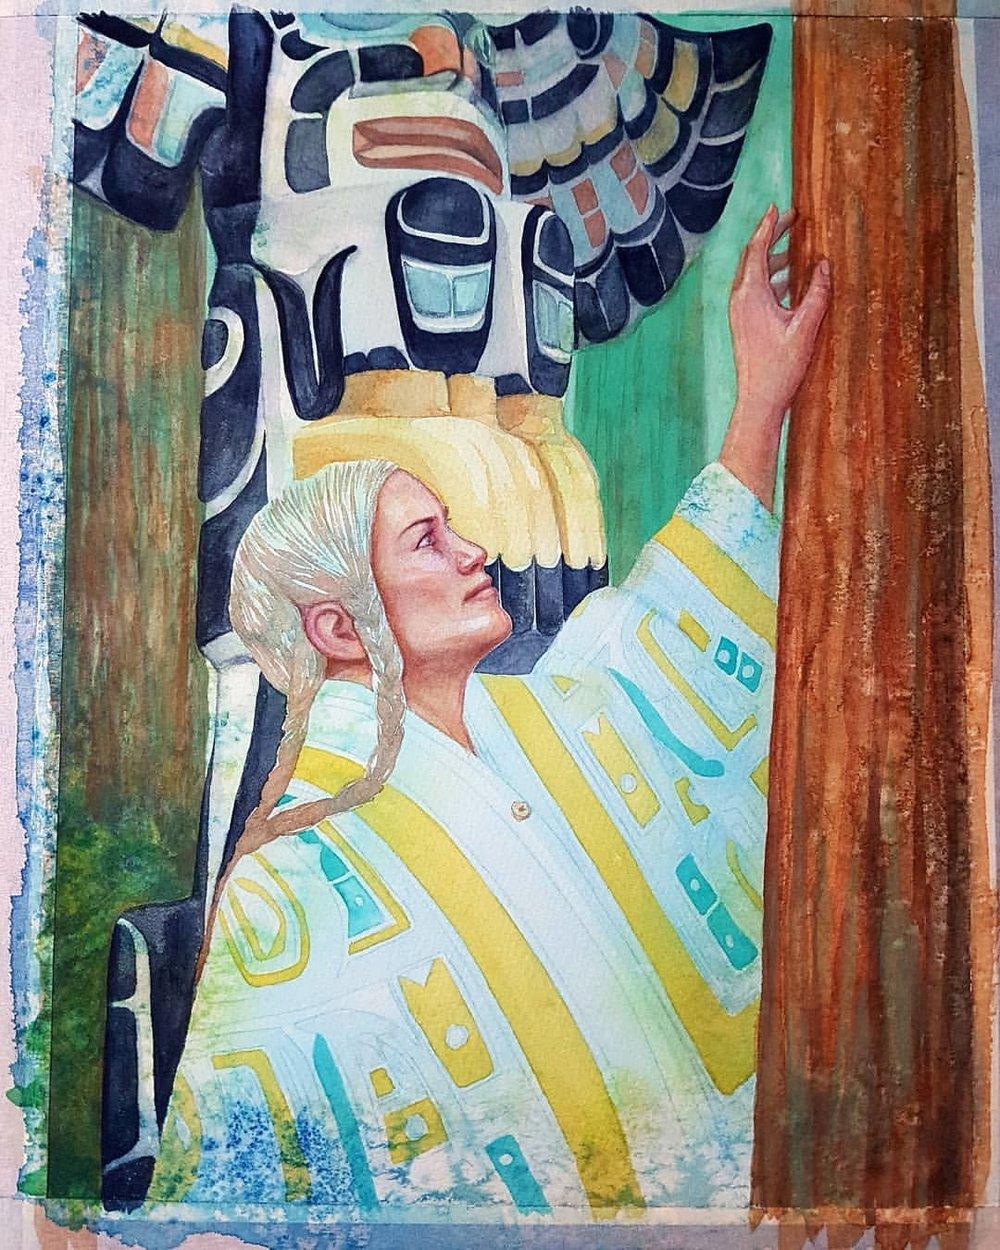 Almost finished 😁    Work in progress for Card 8 - Alaska for Ancient Spirit Oracle Cards   #ancientspirit #oraclecard #workinprogress #blueangel #jadesky #belindaillustrates #australianartist #melbourneartist #june2018 #illustratorsoninstagram